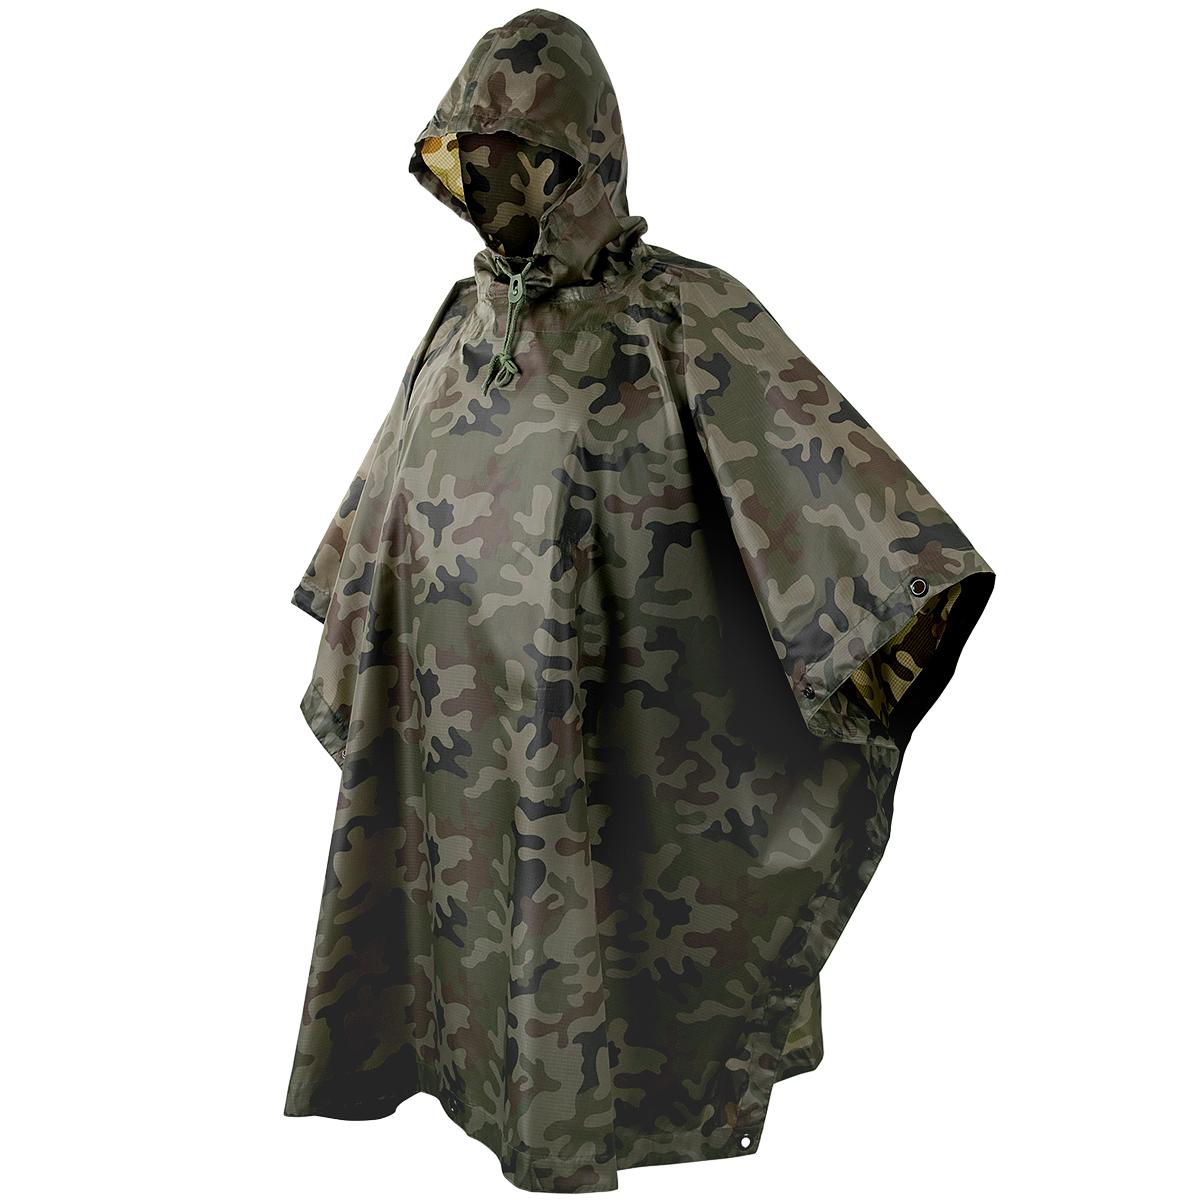 Hooded Ripstop Waterproof Military Poncho Army Festival Helikon Woodland Camo